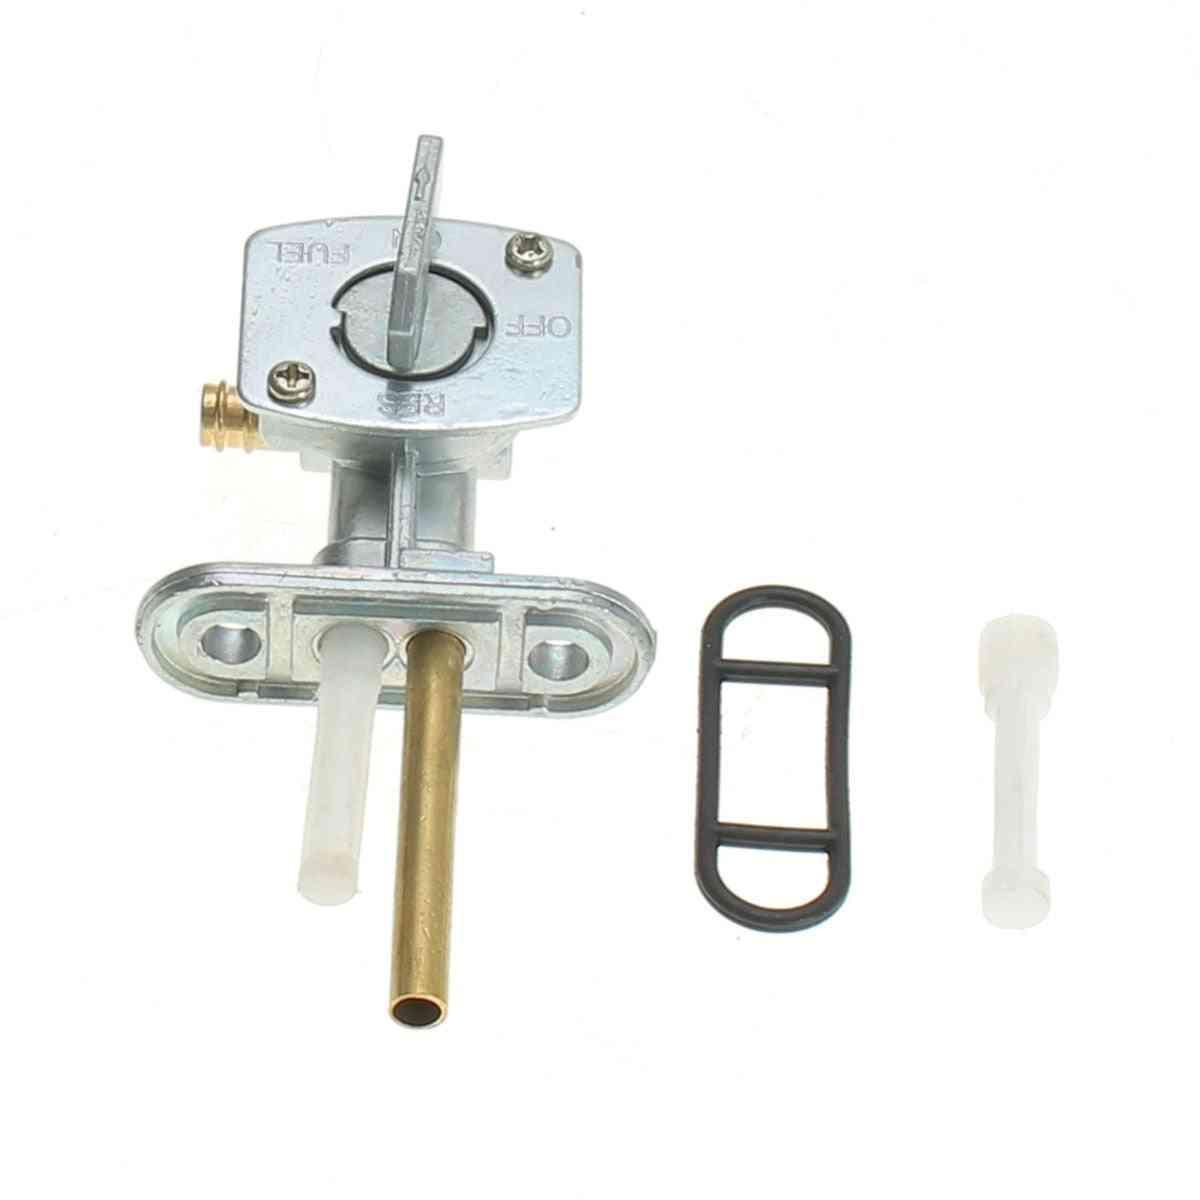 Motorcycle Gas Fuel Petcock Tap, Valve, Switch Pump